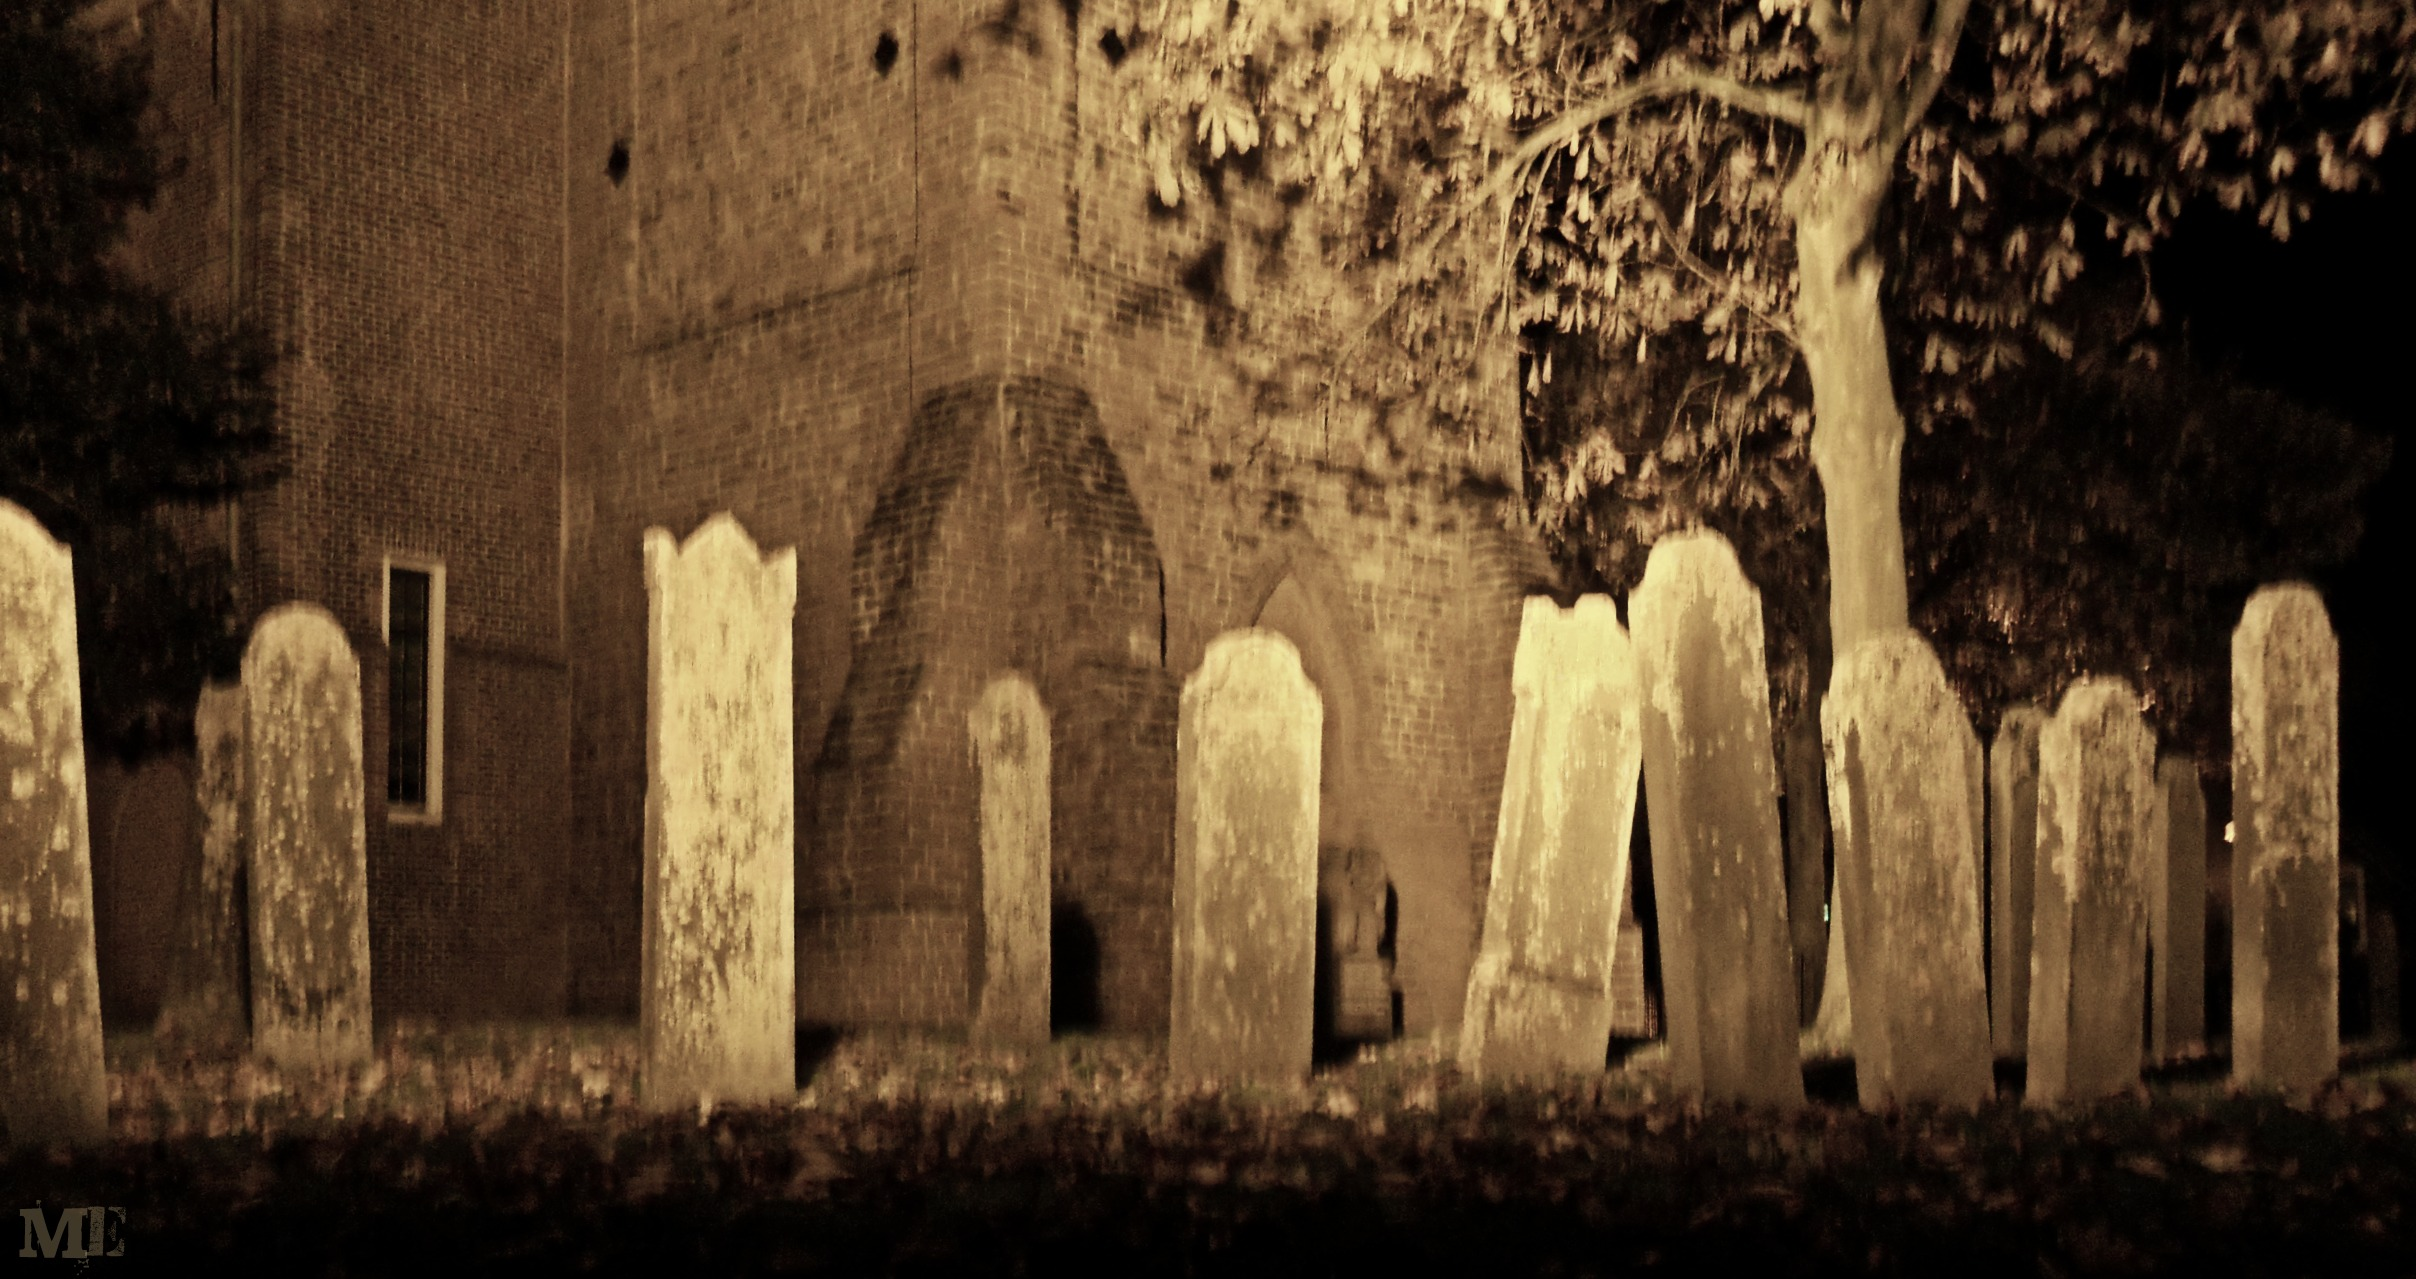 cemetery by eviwinnubst